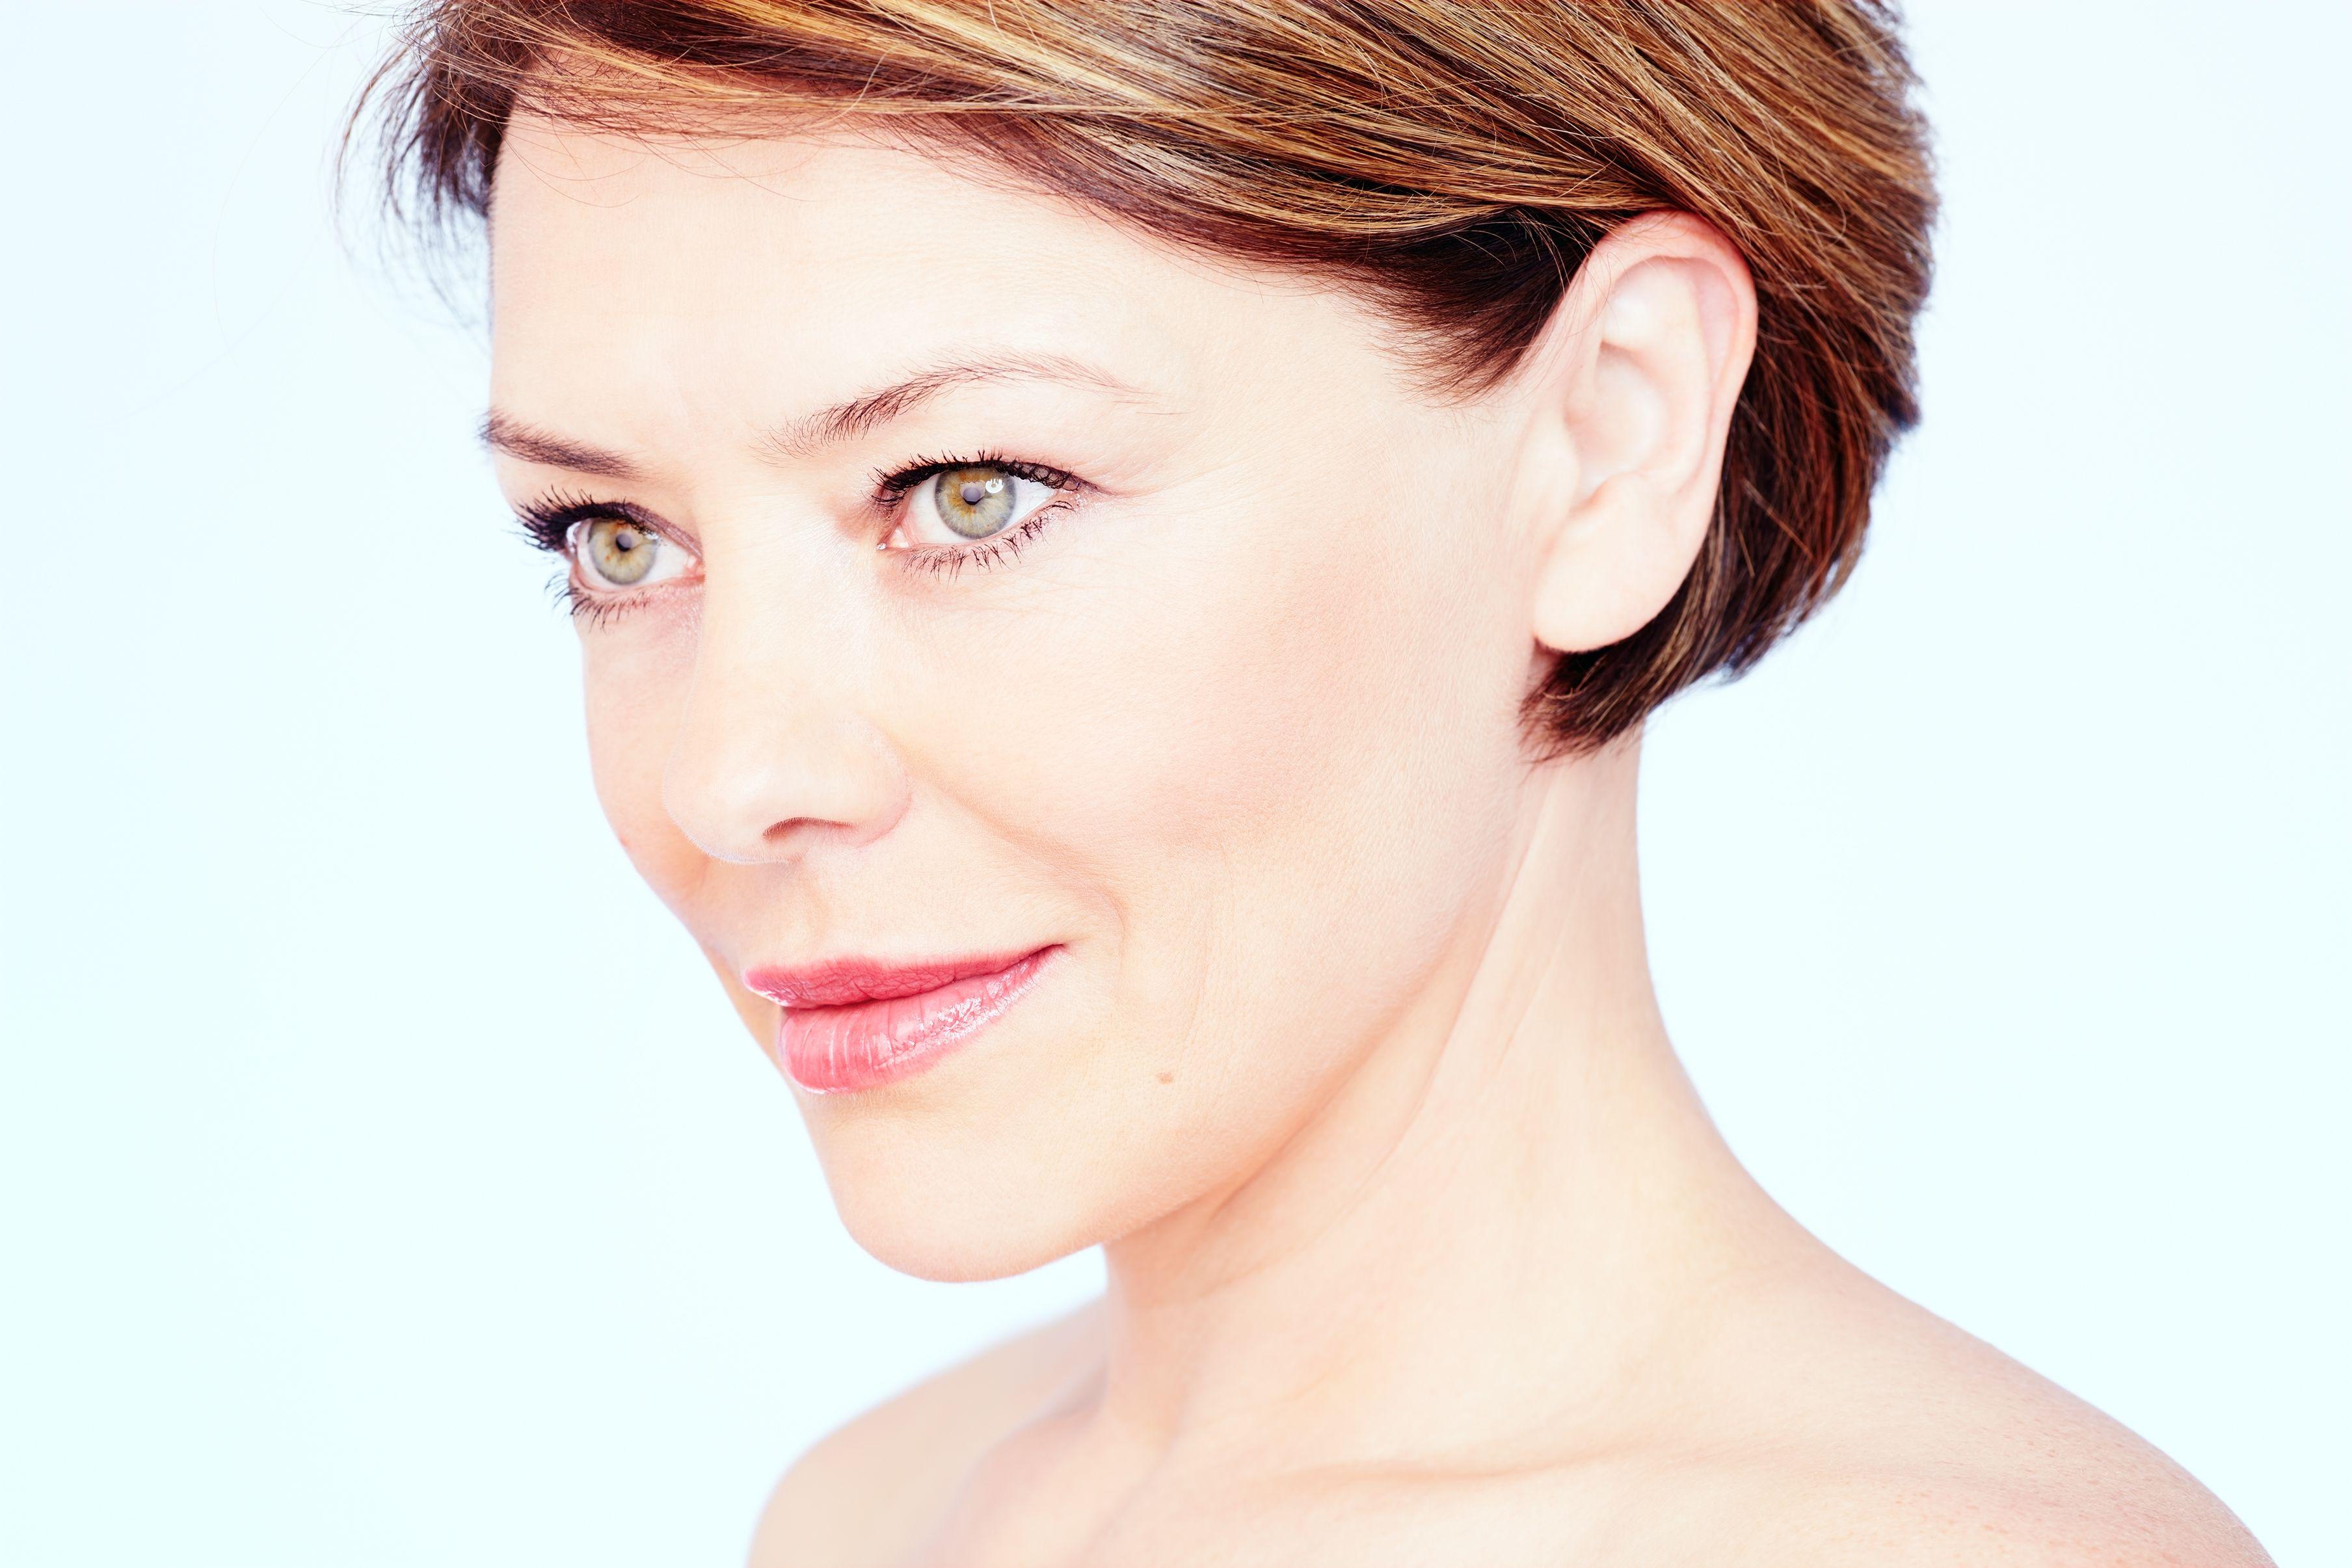 Redensificación facial: Servicios de Tarracomedic medicina estética